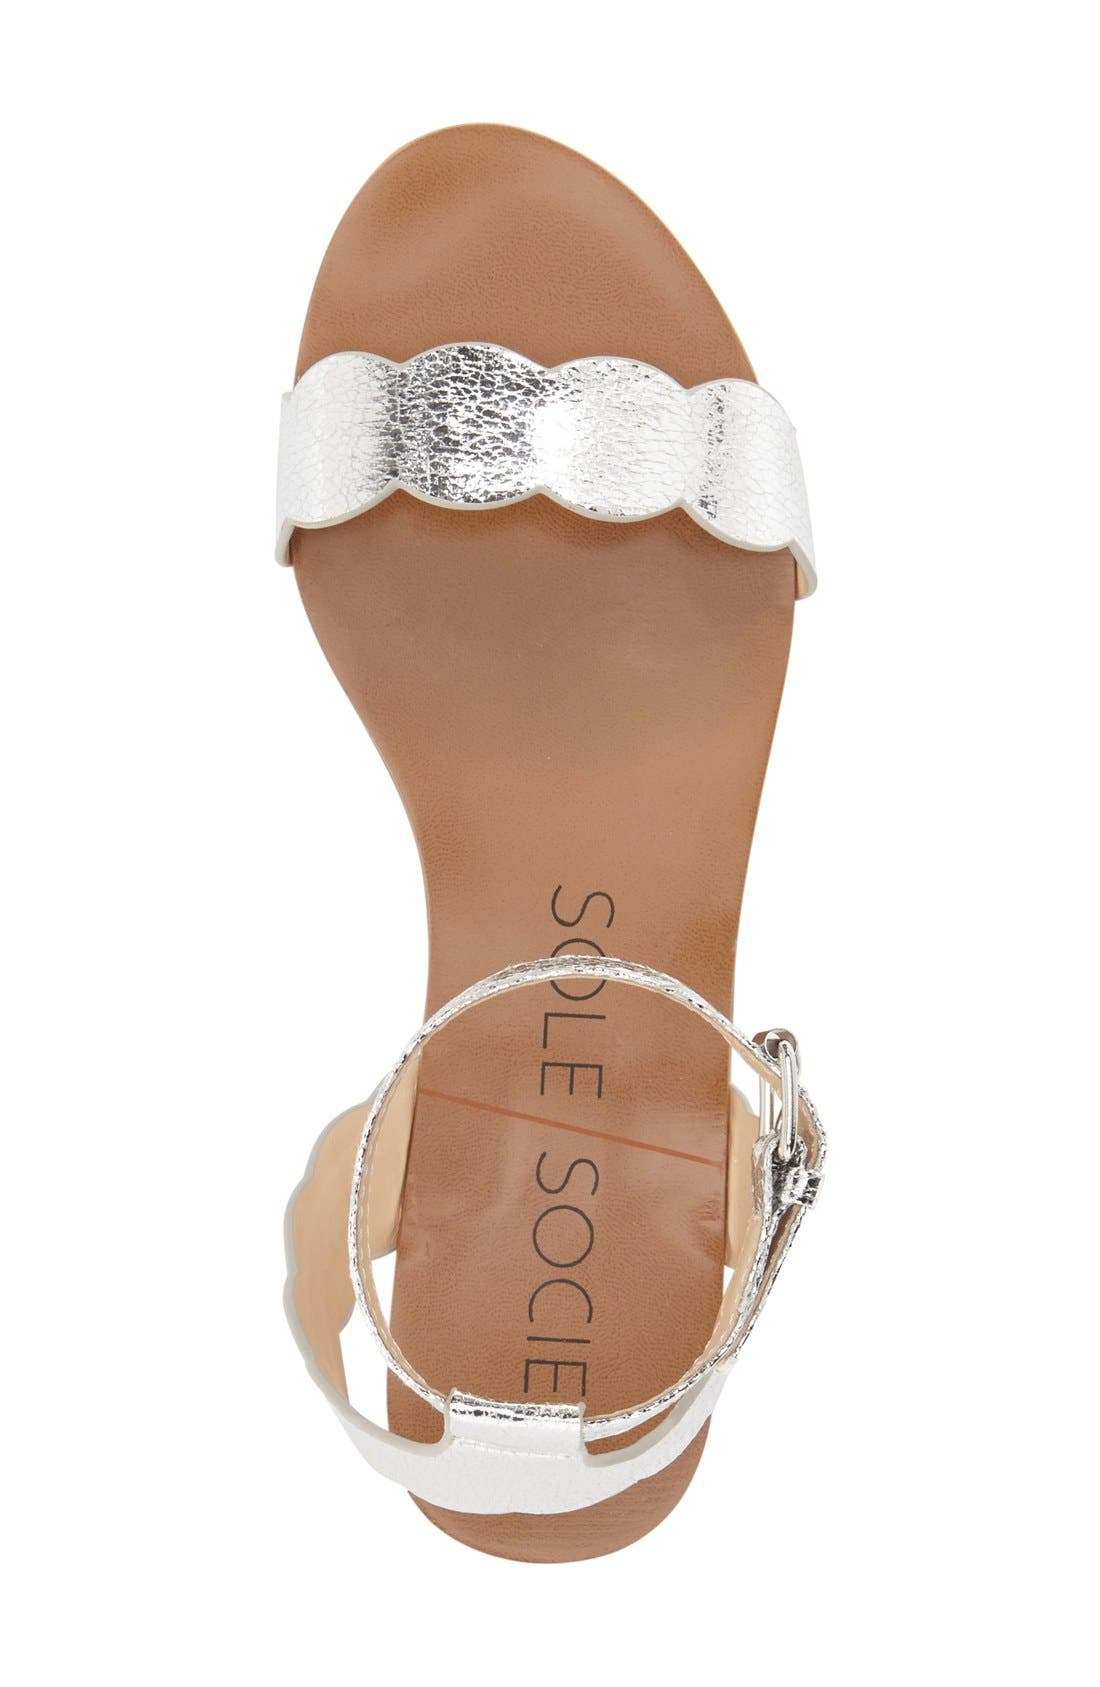 'Odette' Scalloped Ankle Strap Flat Sandal,                             Alternate thumbnail 18, color,